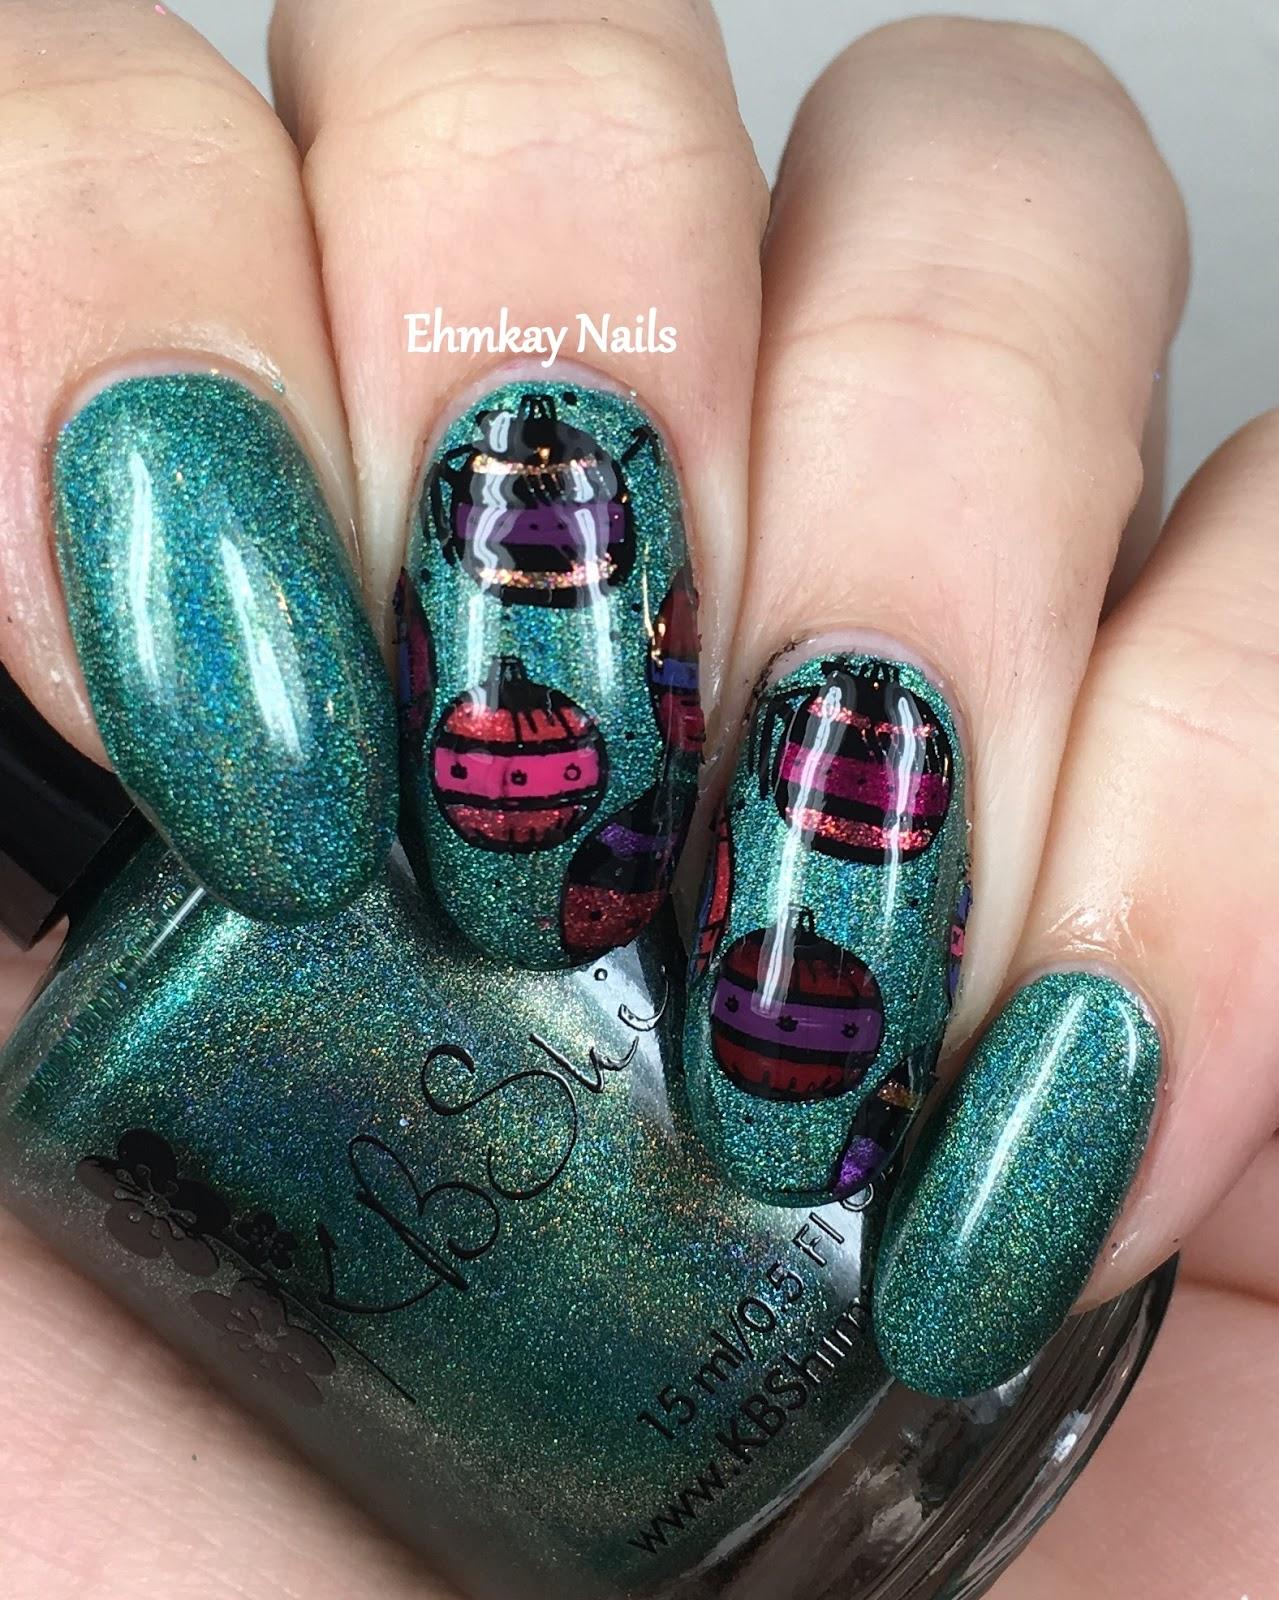 Winter Nail Trends: Ehmkay Nails: Winter Nail Art Challenge: Decorations